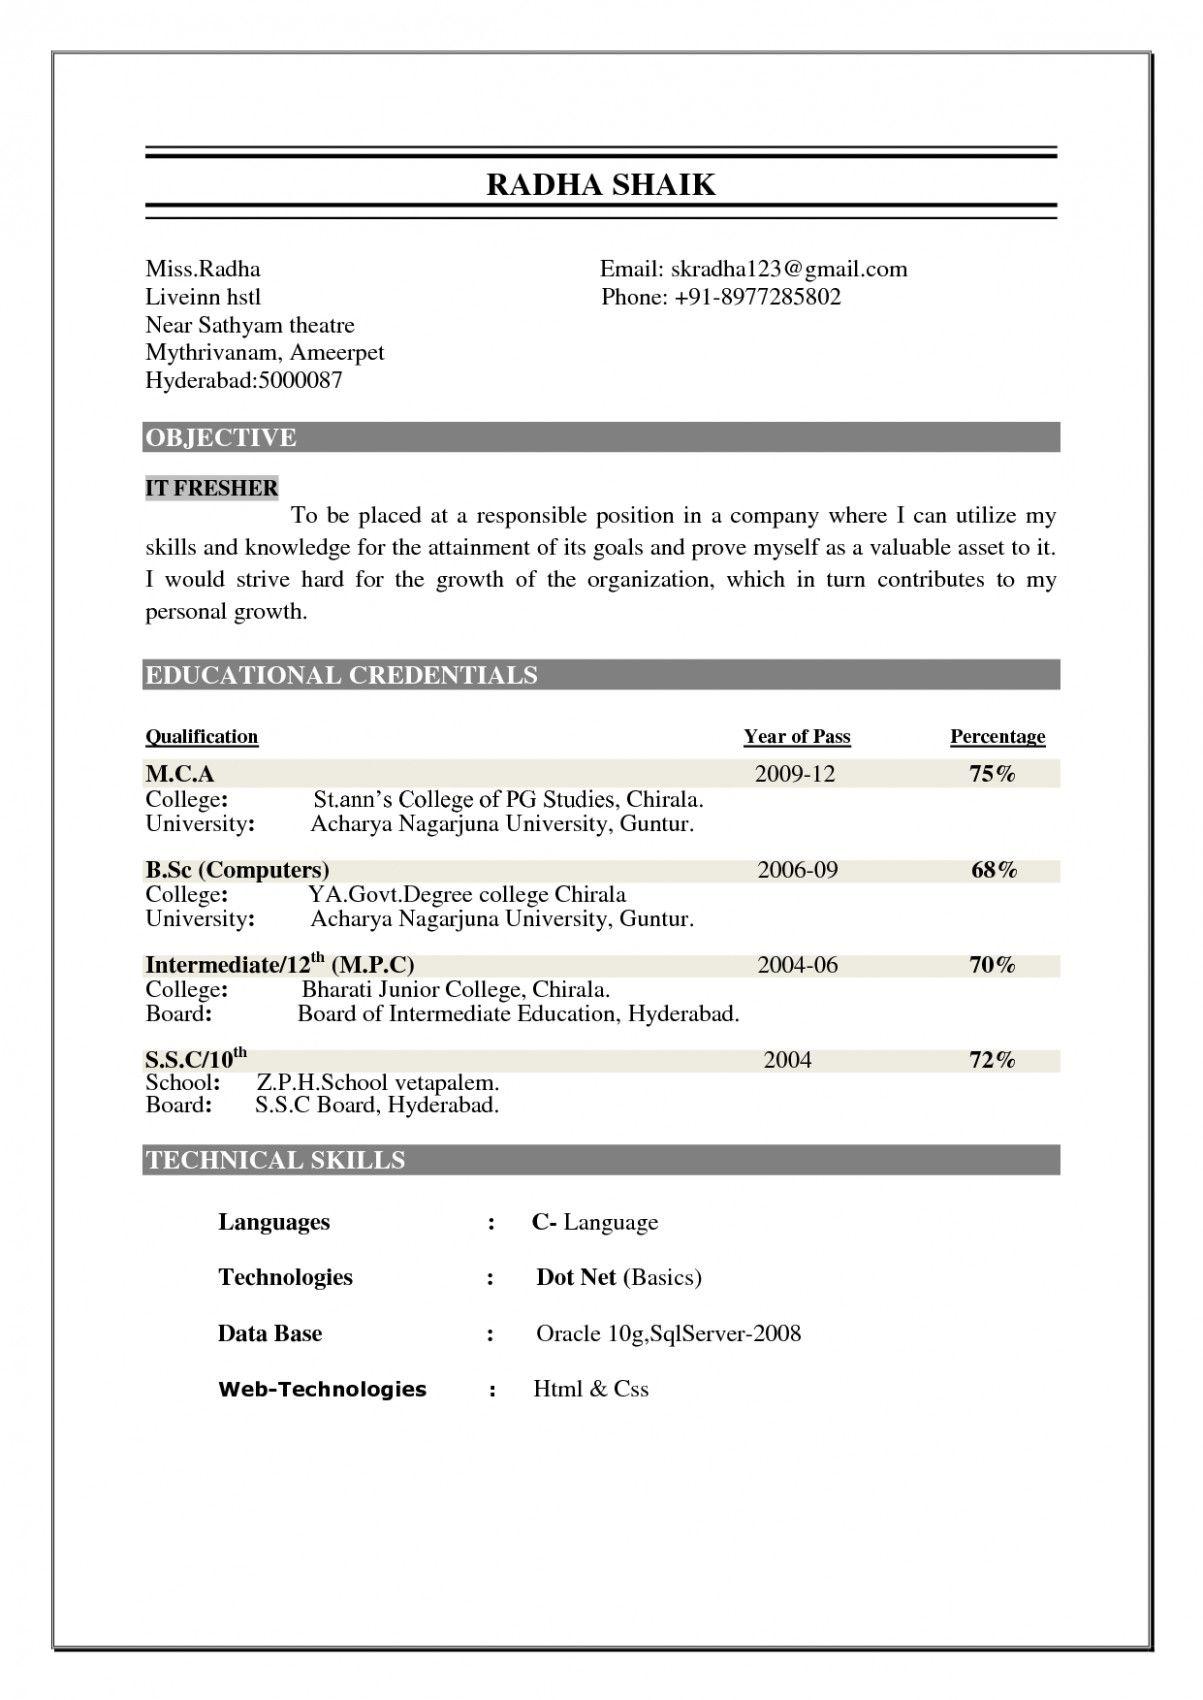 15 Free Obtain Mca More Energizing Resume Format